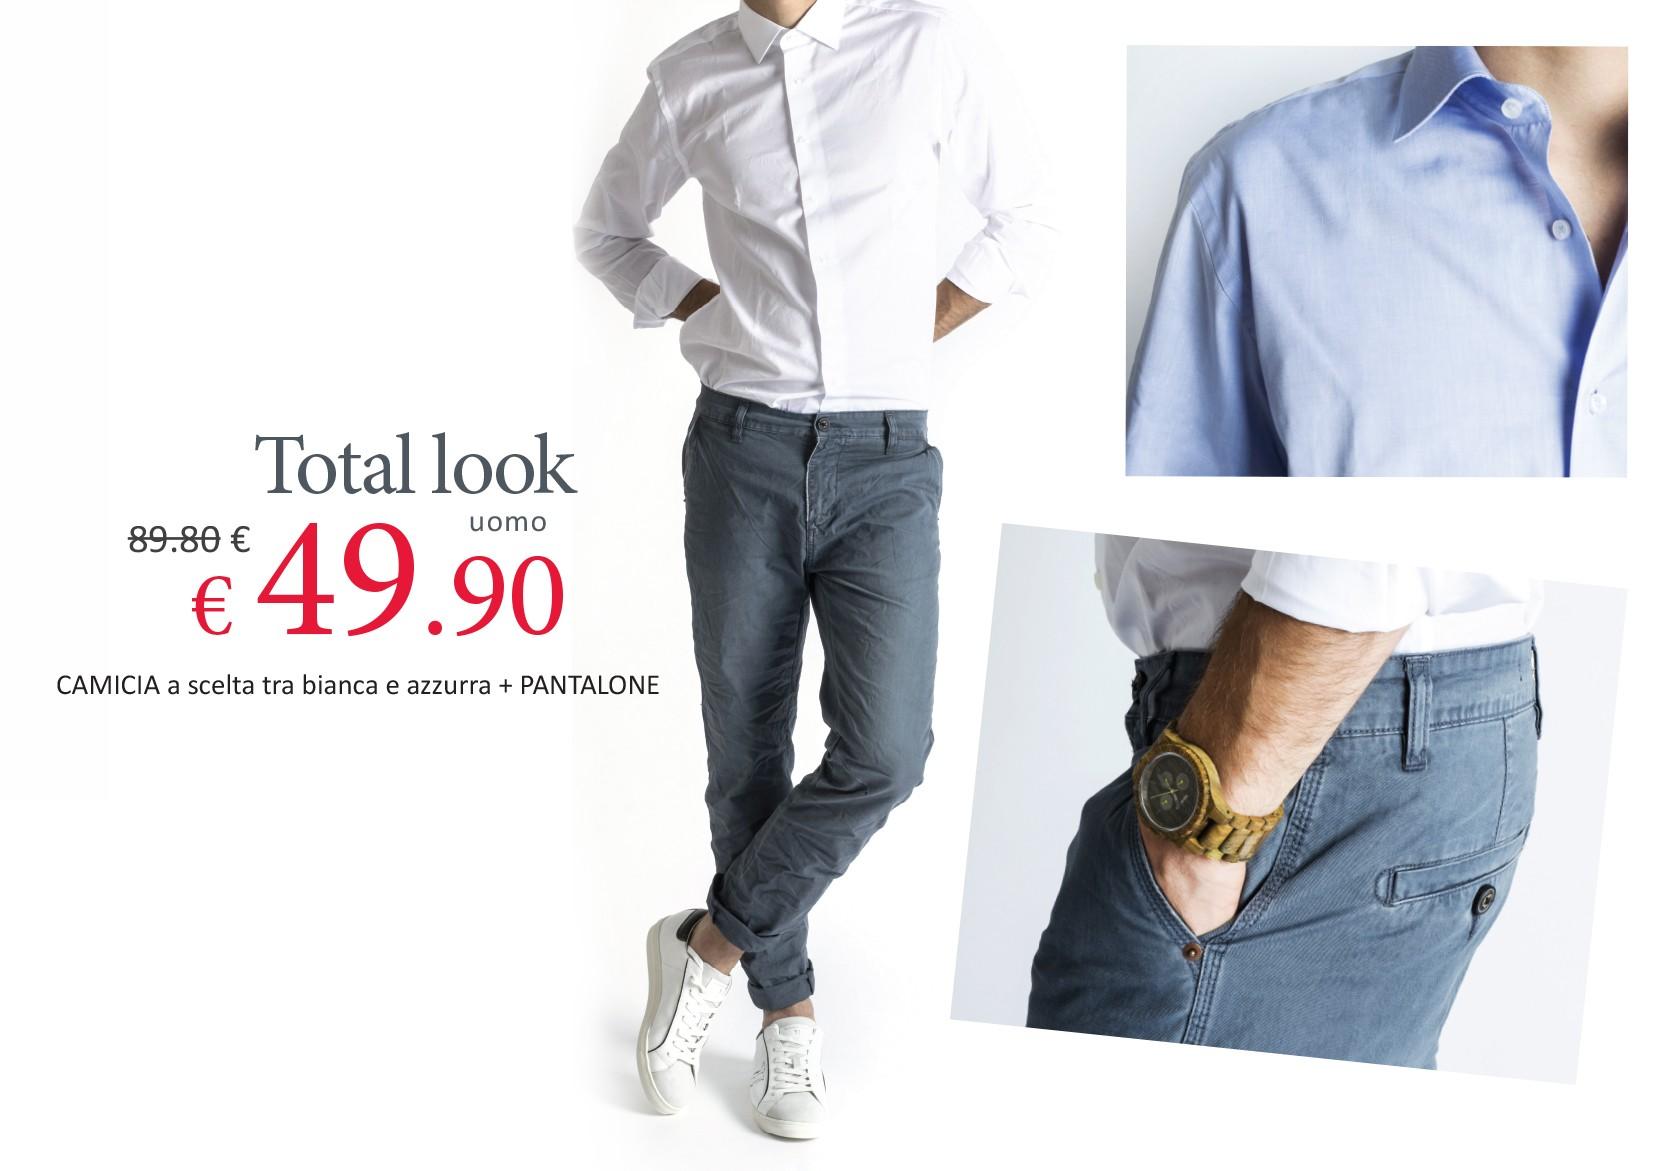 Total Look Uomo a 49,90 euro